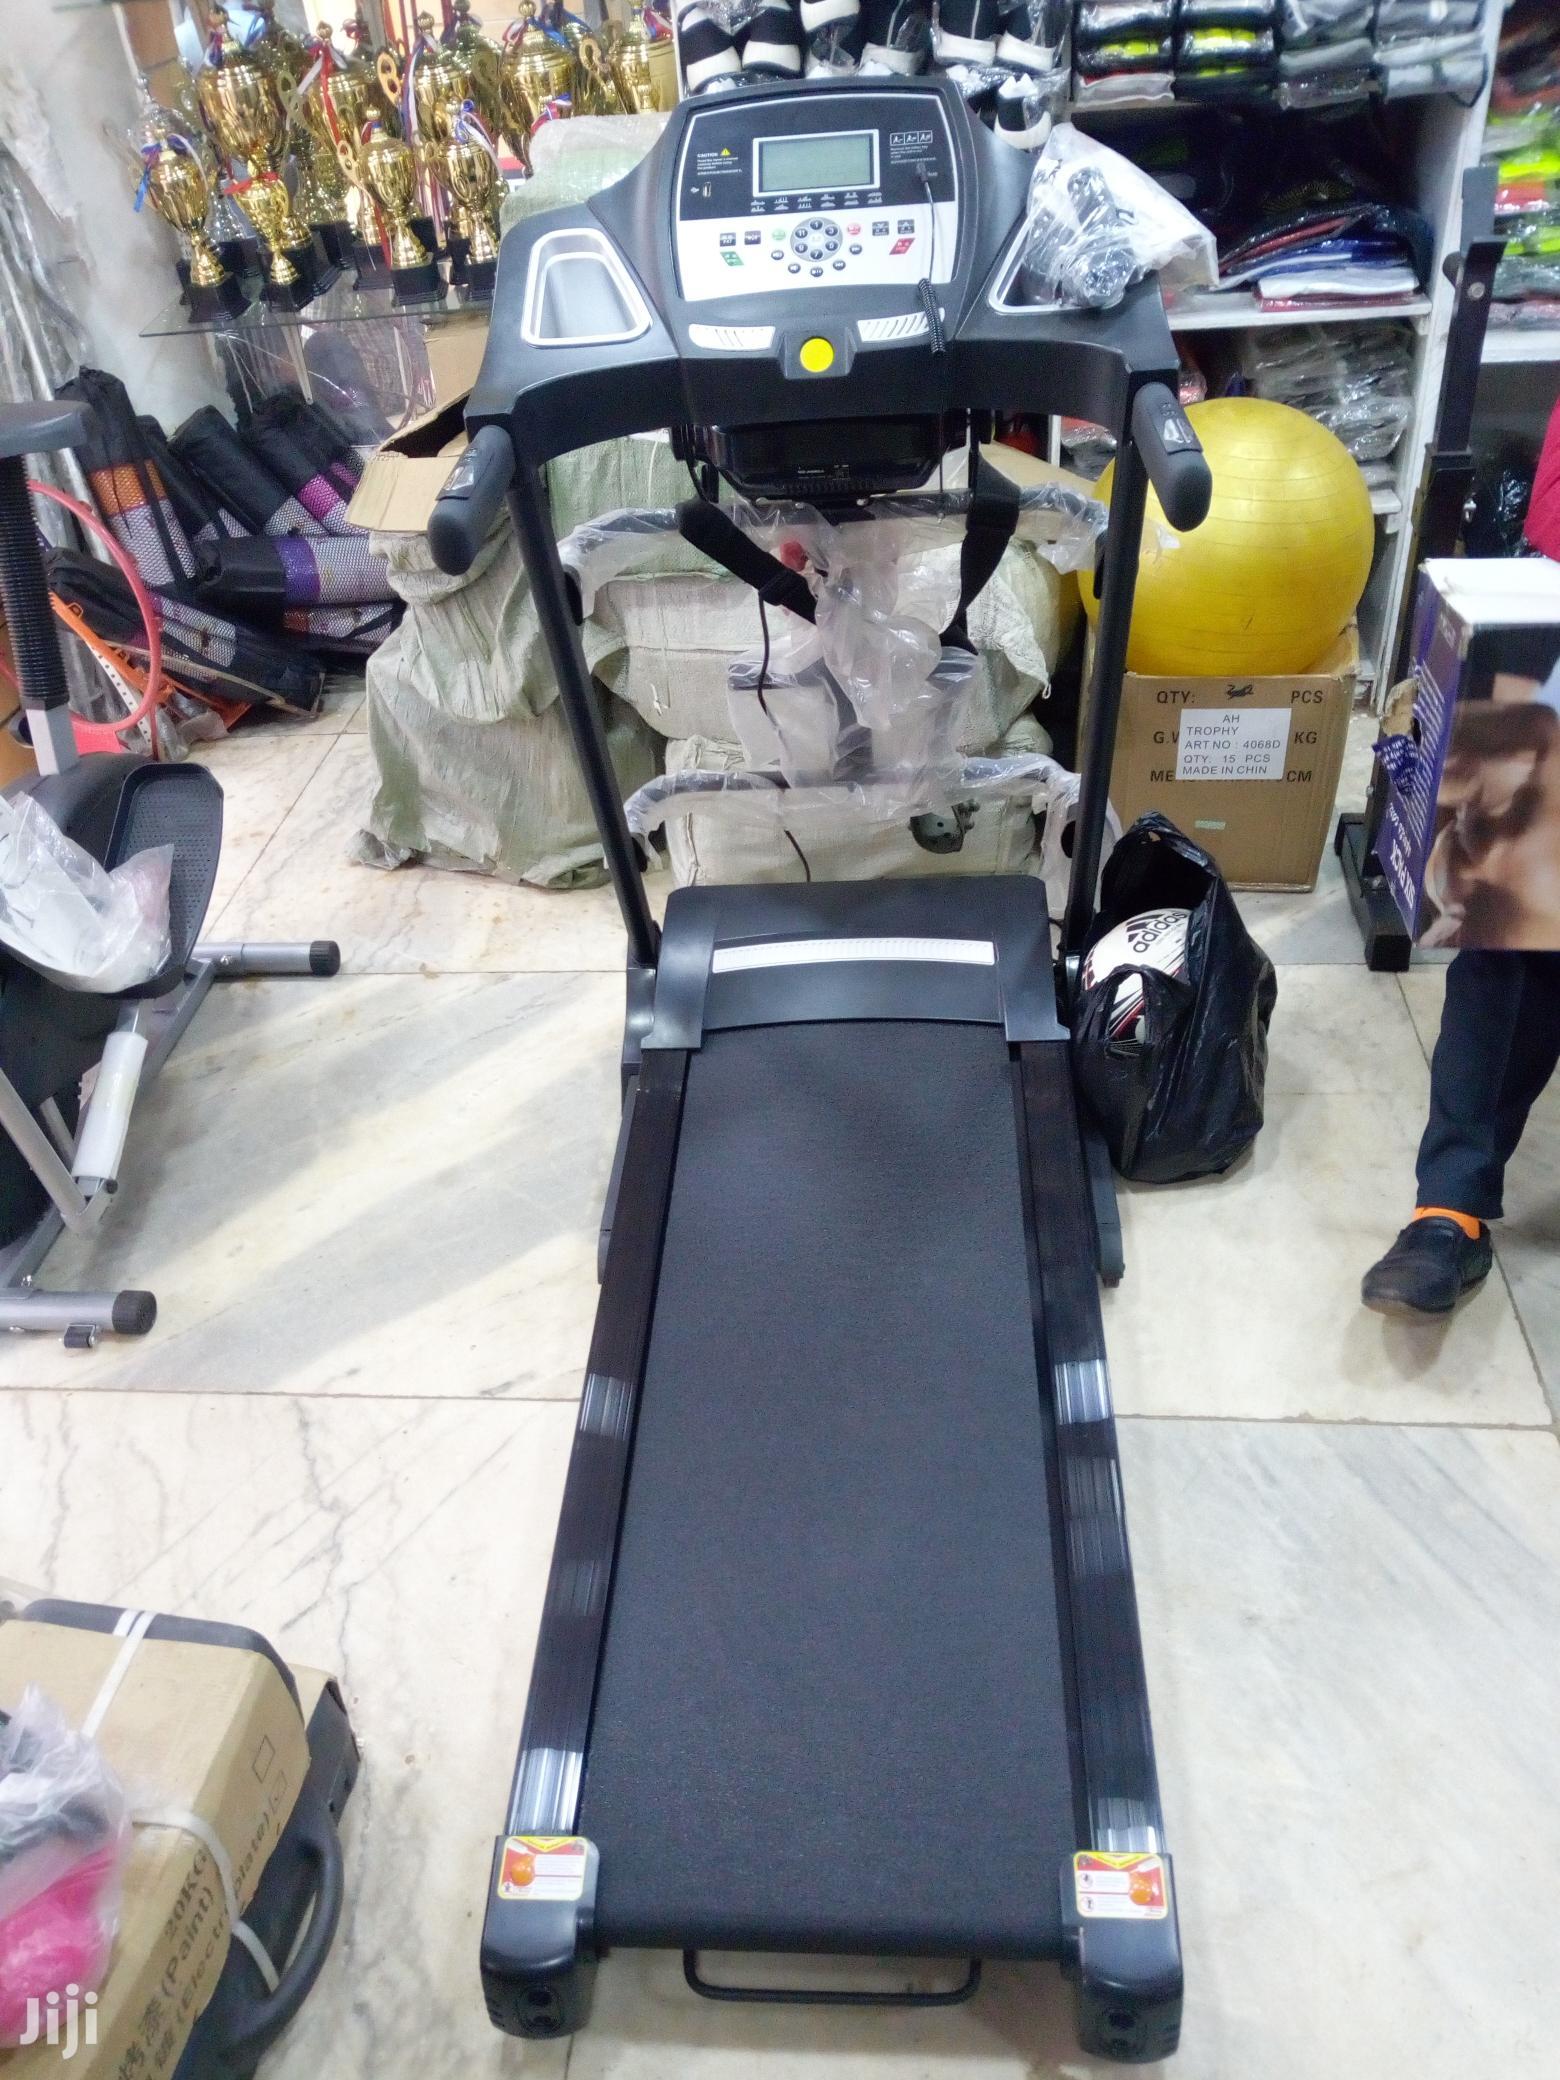 Sport Treadmills